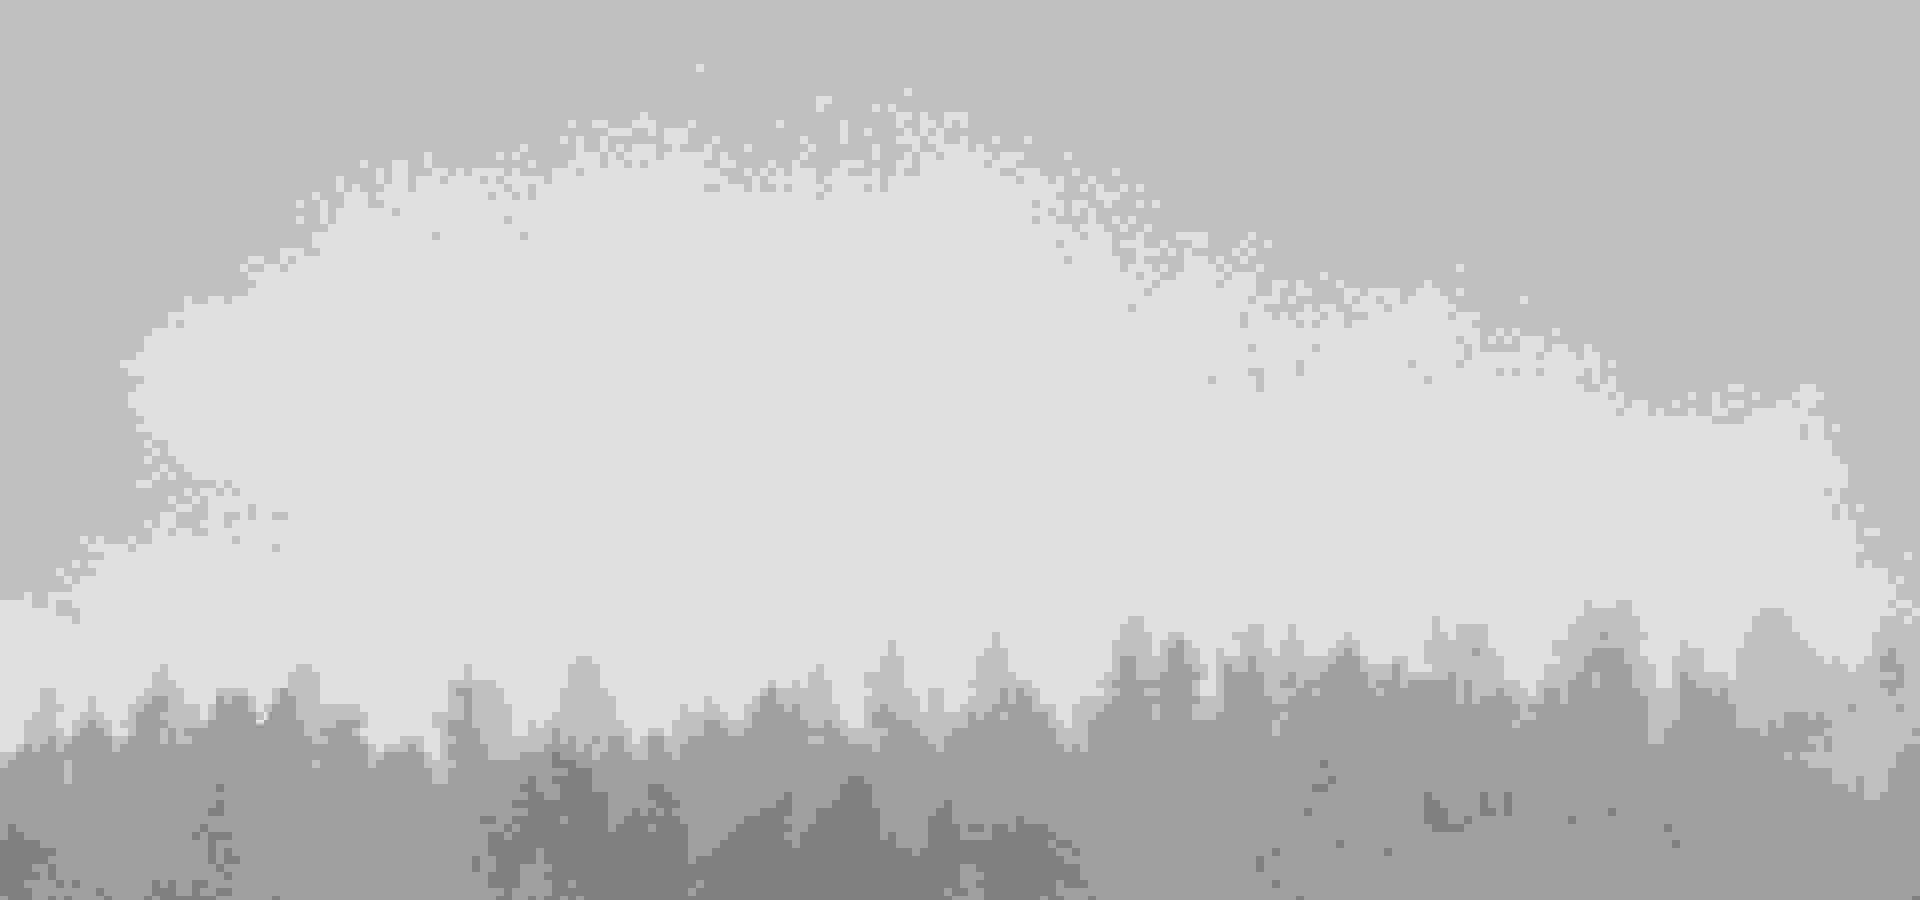 woods, skog, ted logart, 1280 x 1638